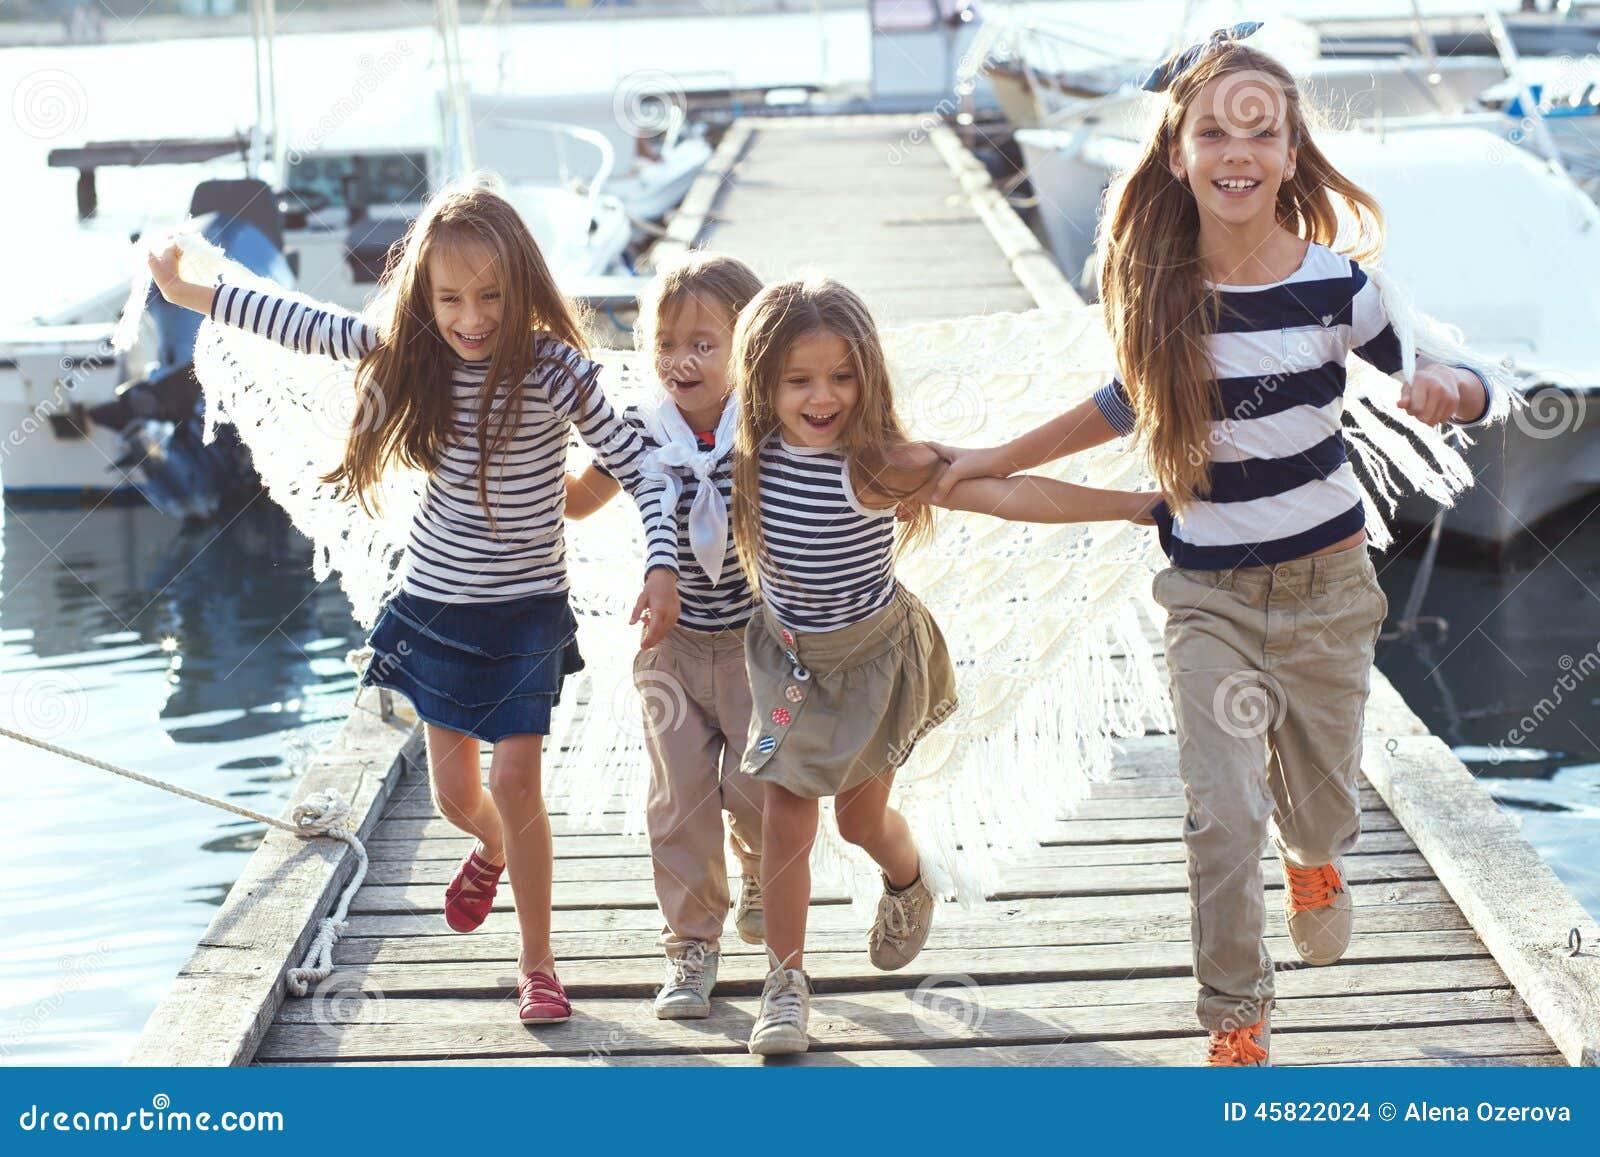 Fashion Kids Stock Photo Image 45822024